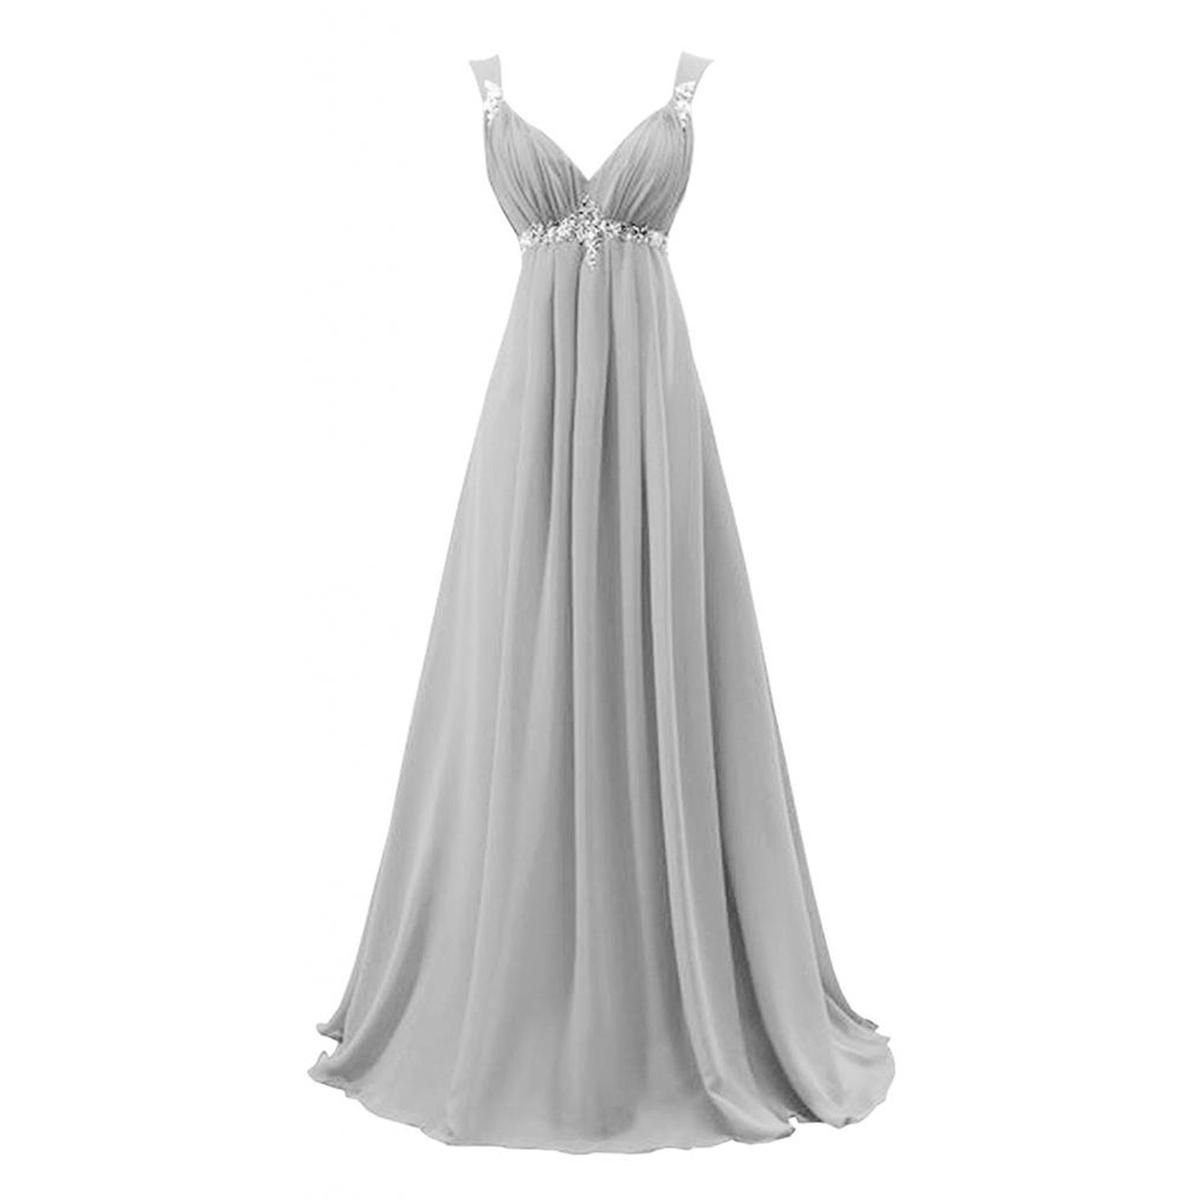 0407c124abb8 Chic Light Gray V Neck Long Prom Dress, Beaded Empire Floor Length Prom  Dress, Elegant Sleeveless Lace-up Chiffon Prom Dress, #020102716 on Storenvy